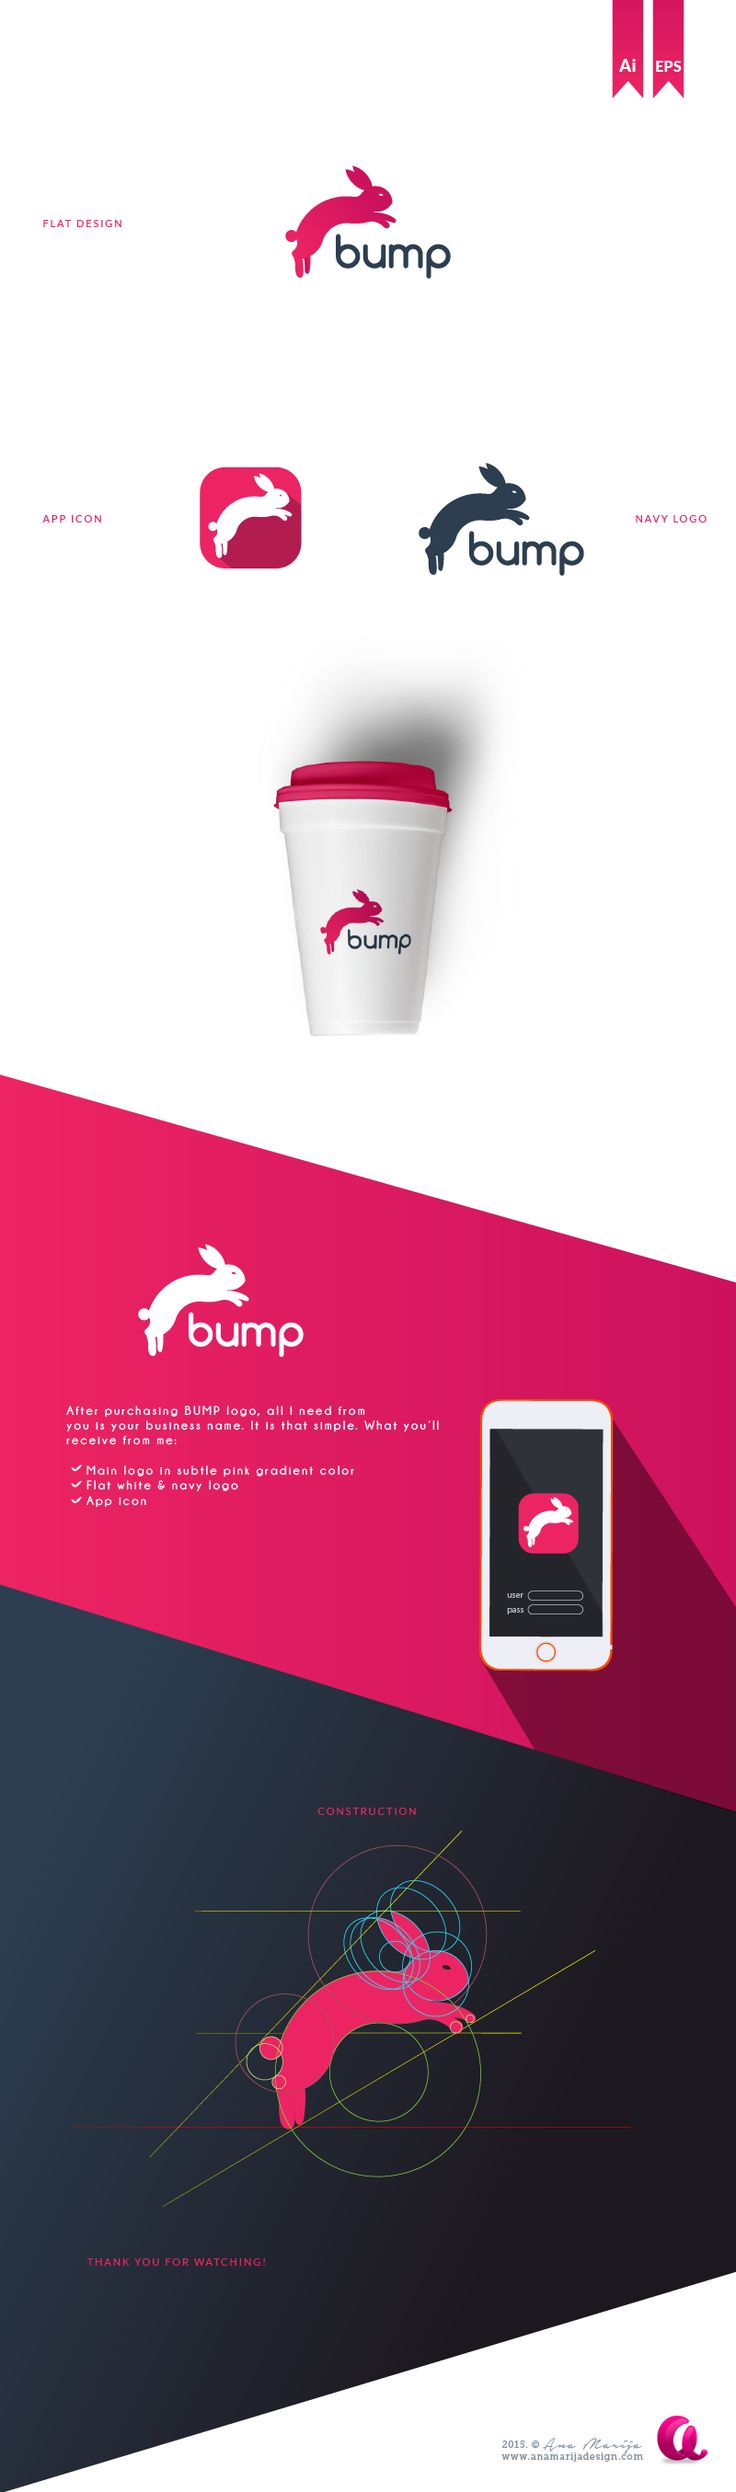 Bump - jumping rabbit logo on Behance